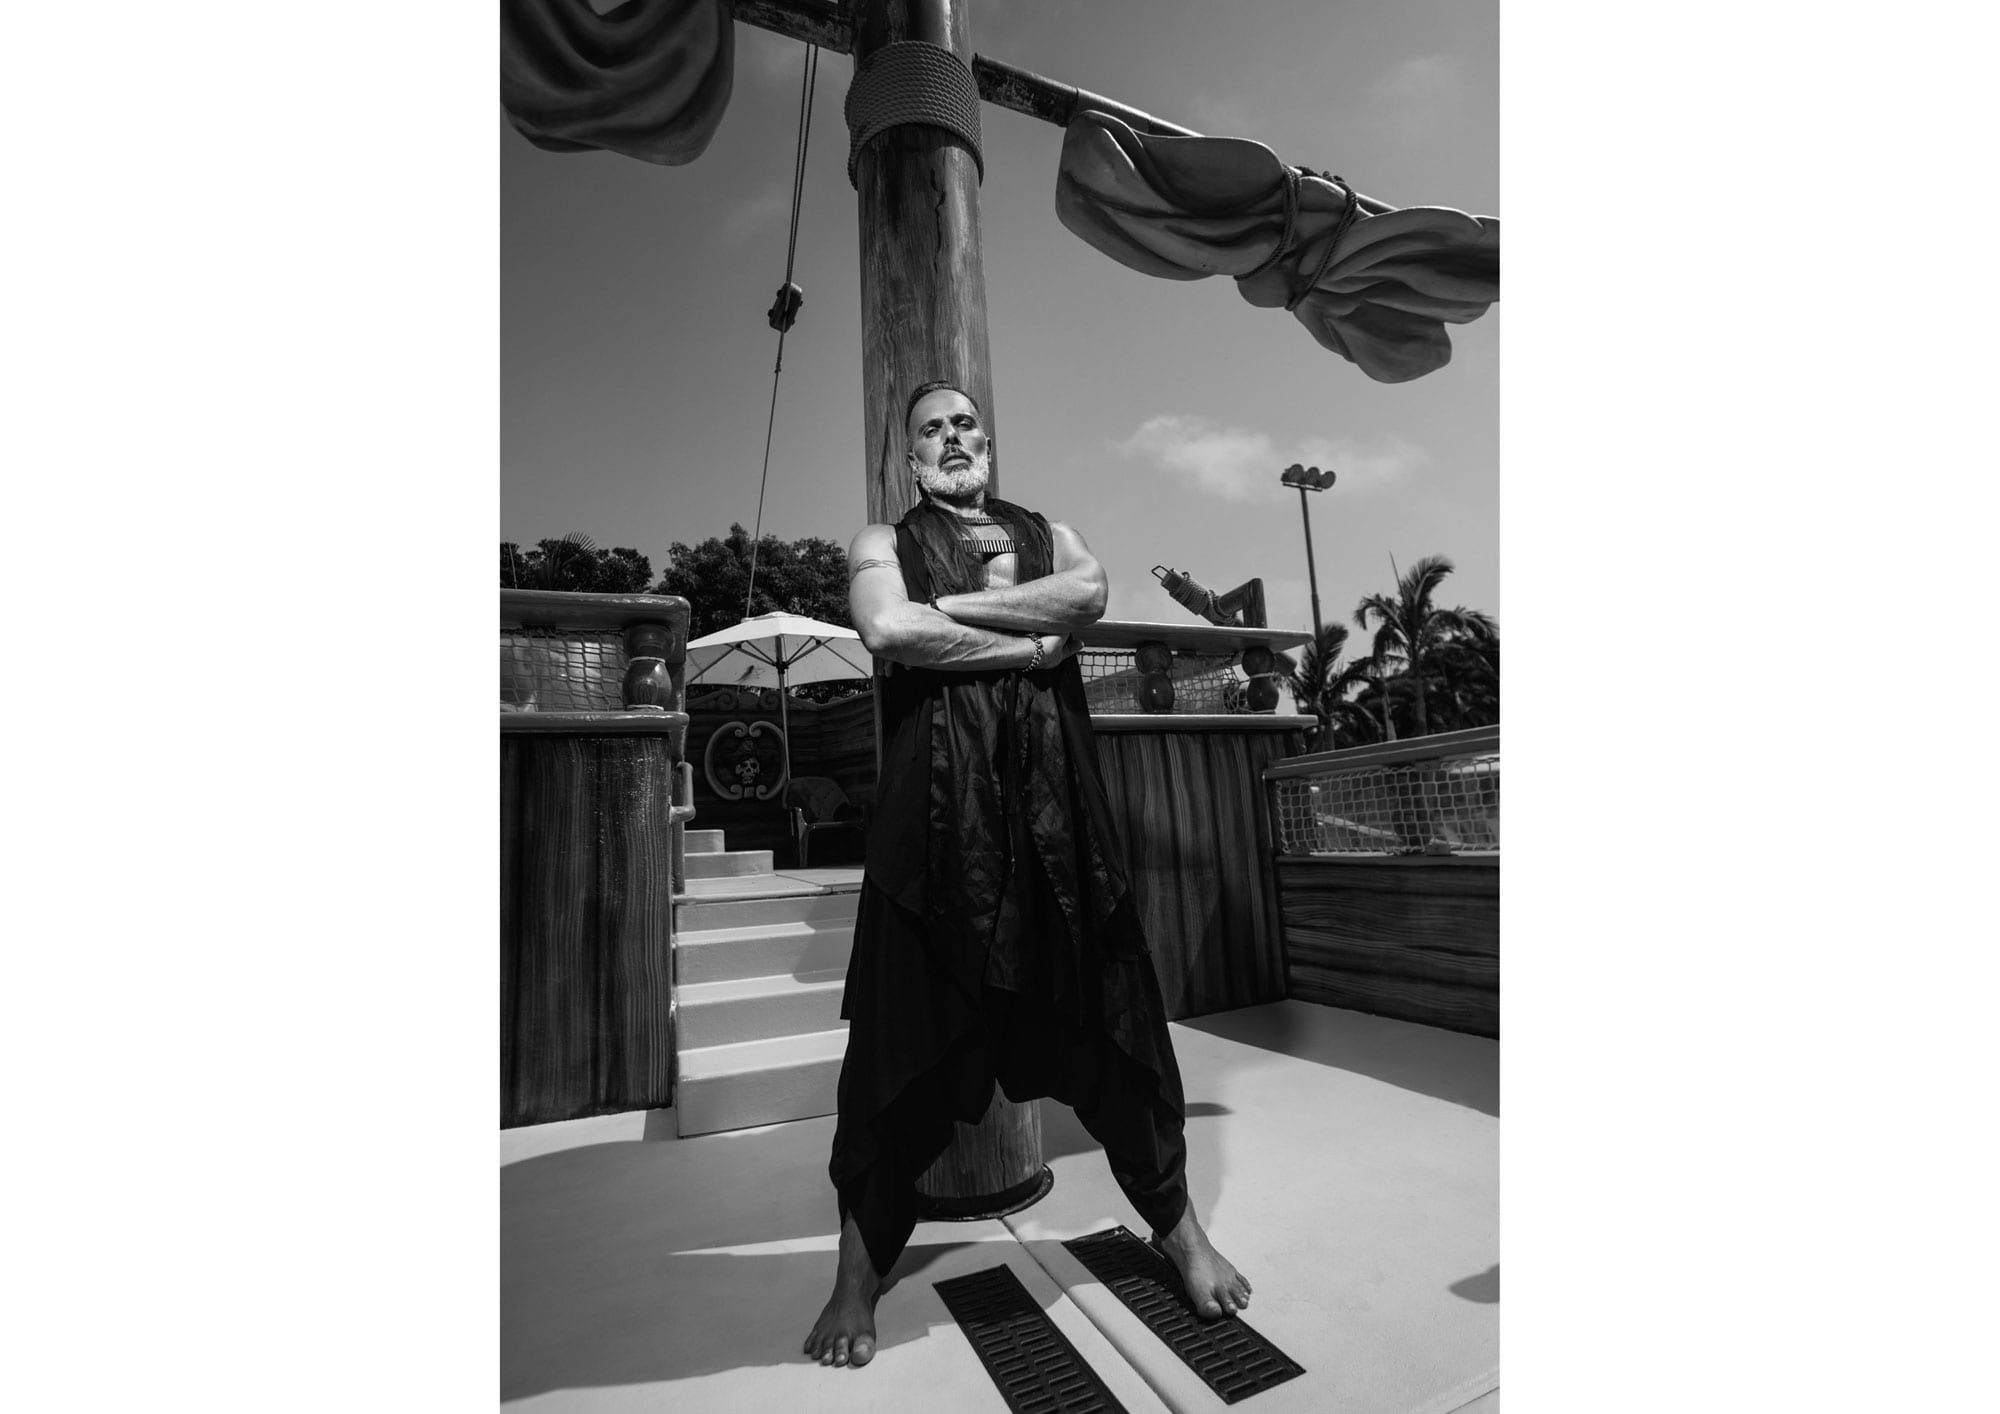 25Photography: Segev Orlev Styling: Mauricio Arcillo, Fashion: Aarketa, Makeup Artist: Orna Rimok, Hair Stylist: Elad Uziel, Hair & Makeup: lior krispel, Models: Sami Dadon, Yinon Perets, Ldor Bar Or, Yaniv Putterman, Producer: Orna Rviztky for Fashion Israel, Pr: Rotem Lalush